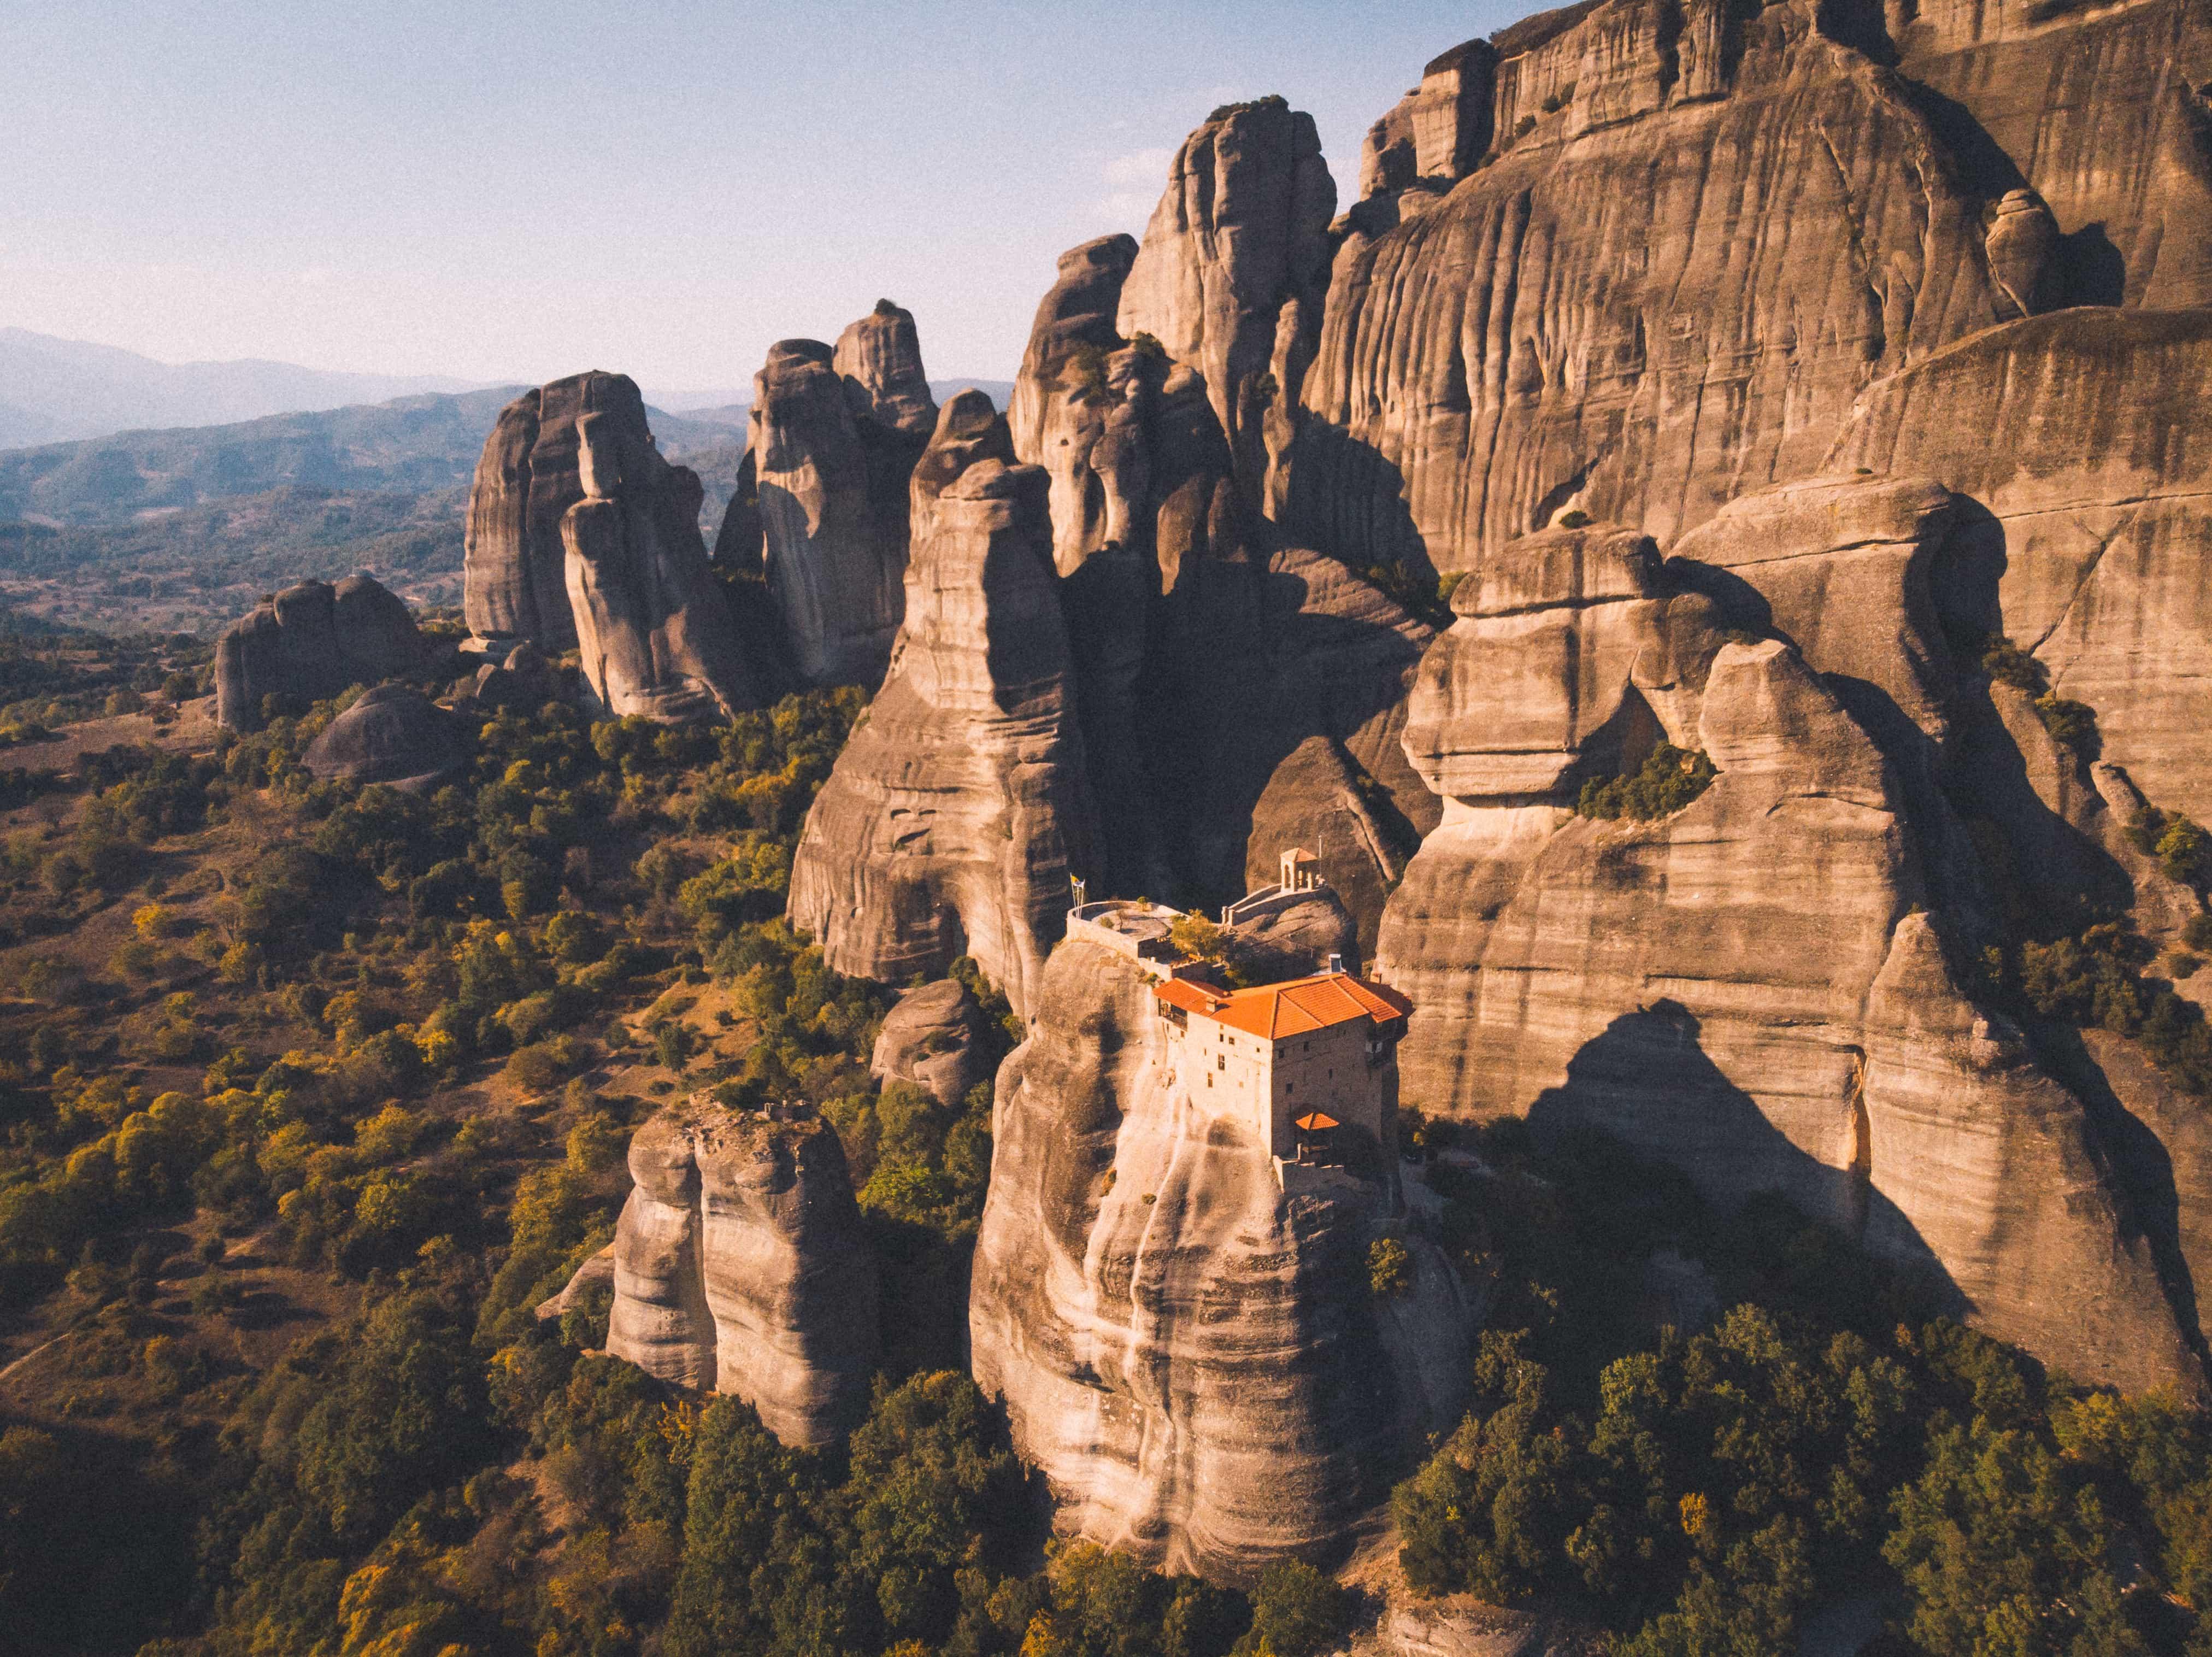 instagrammable places in Greece, Meteora Greece, Meteora, Things to do in Meteora, Things to see in Meteora